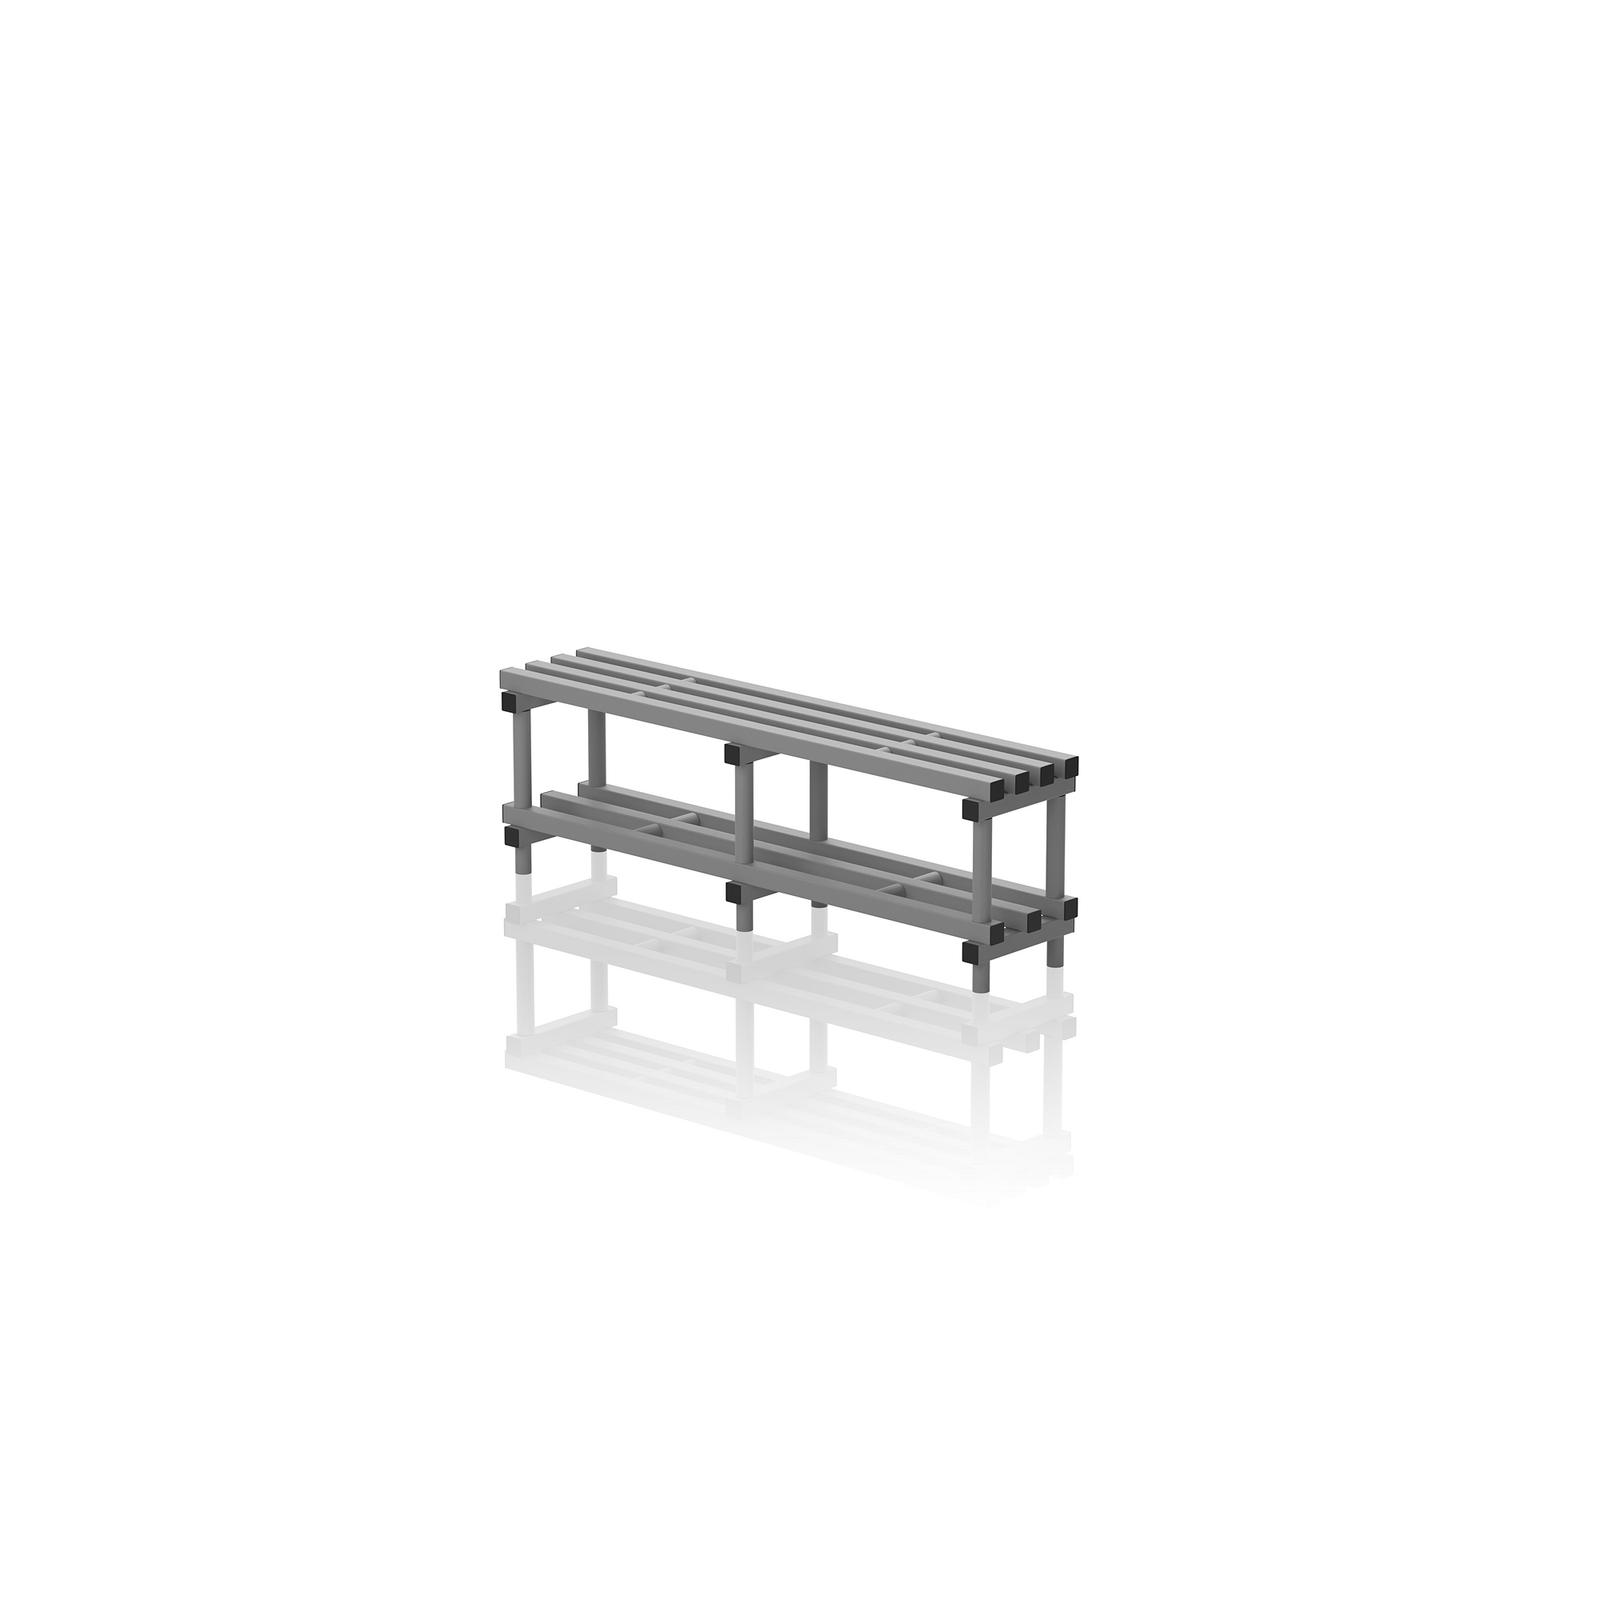 Bench With Bottom Shelf Large Grey